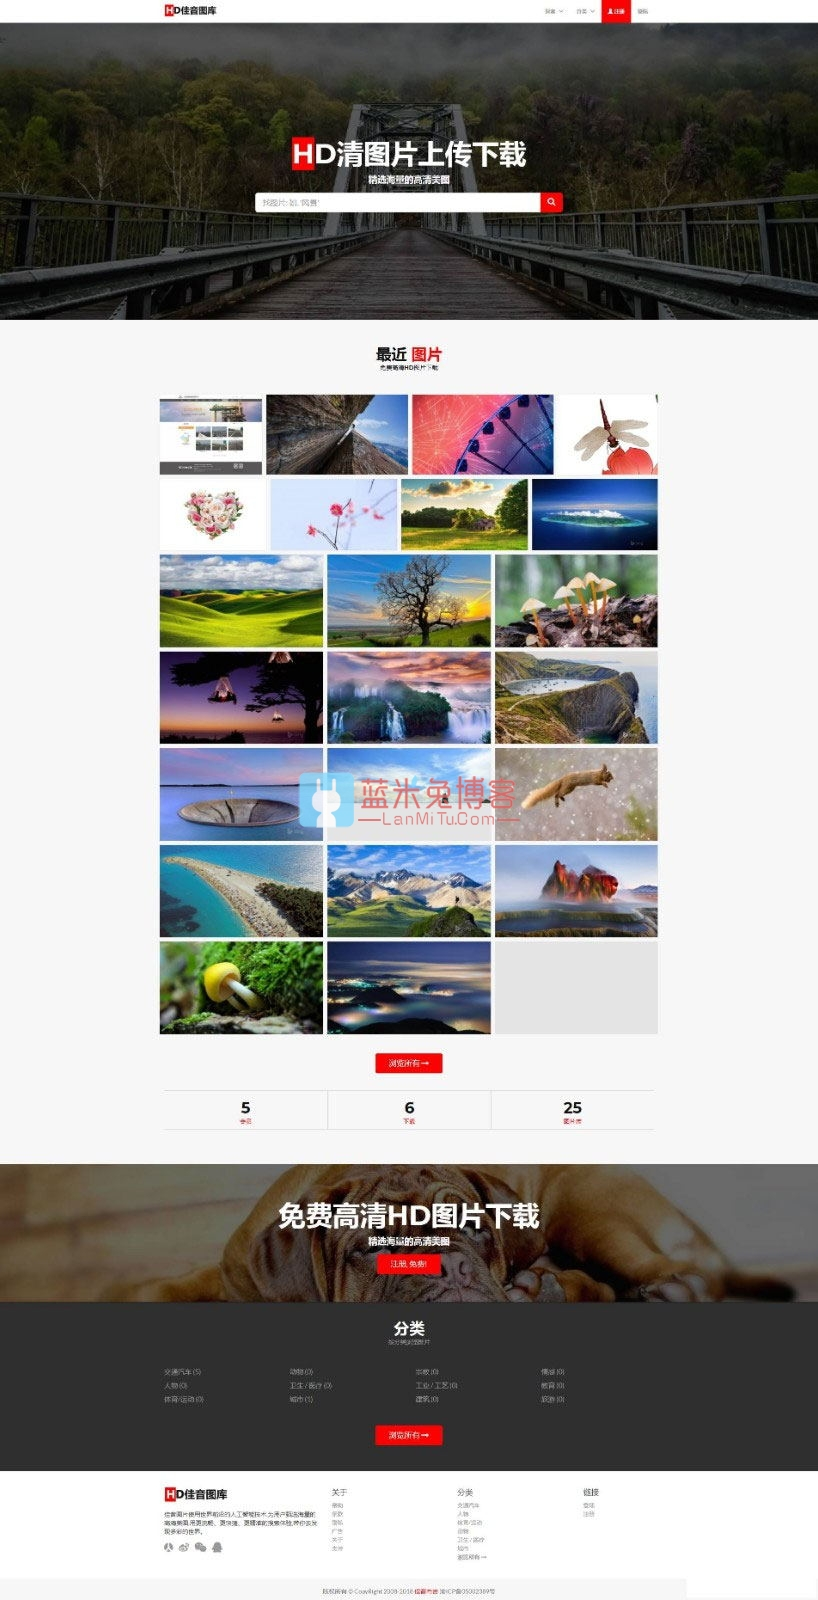 Laravel框架 高清壁纸图库图片分享上传下载网站php源码